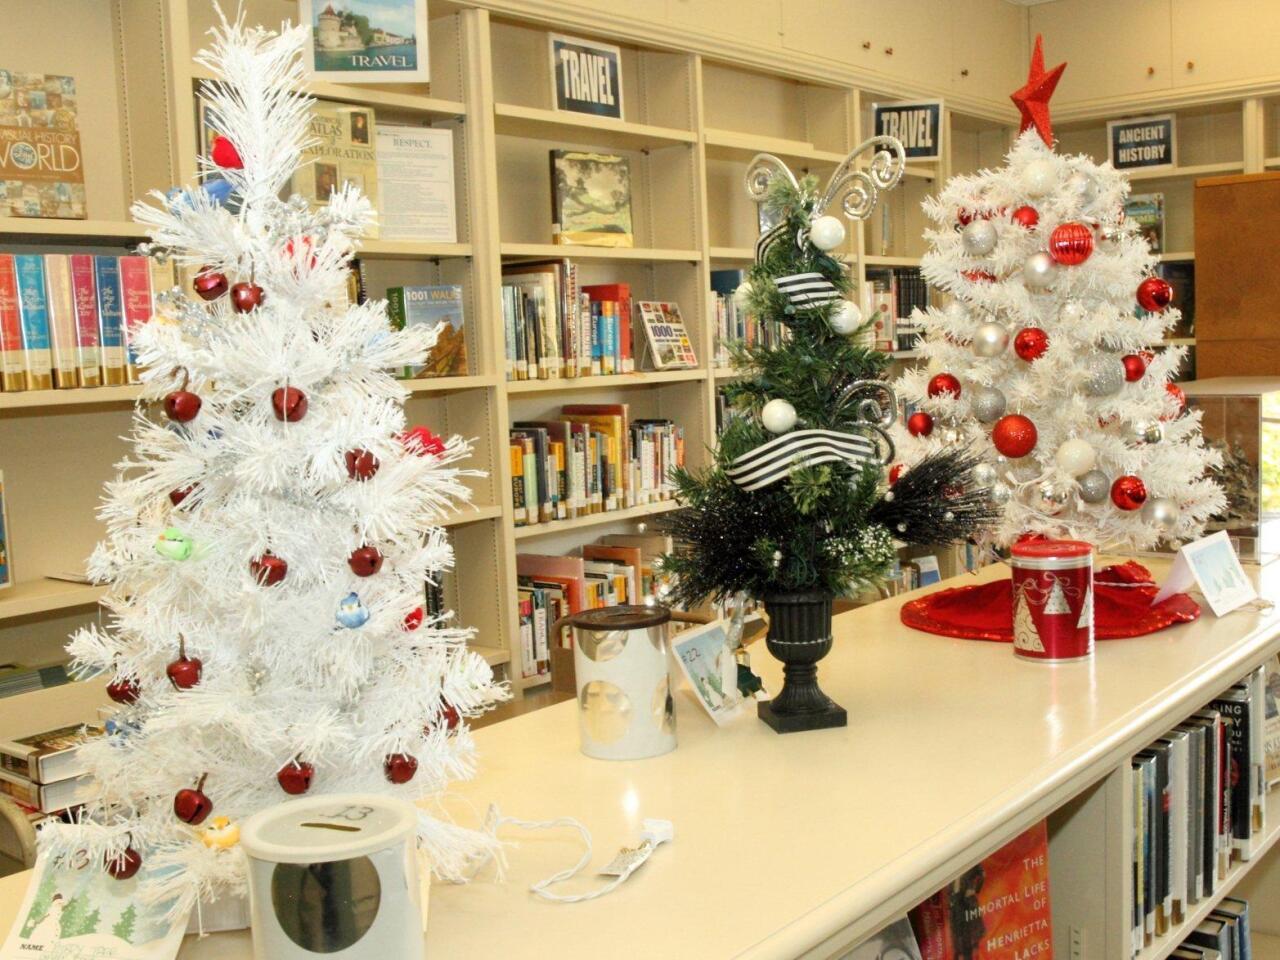 Birdy Tree, Tuxedo Tree, Red & White Tree